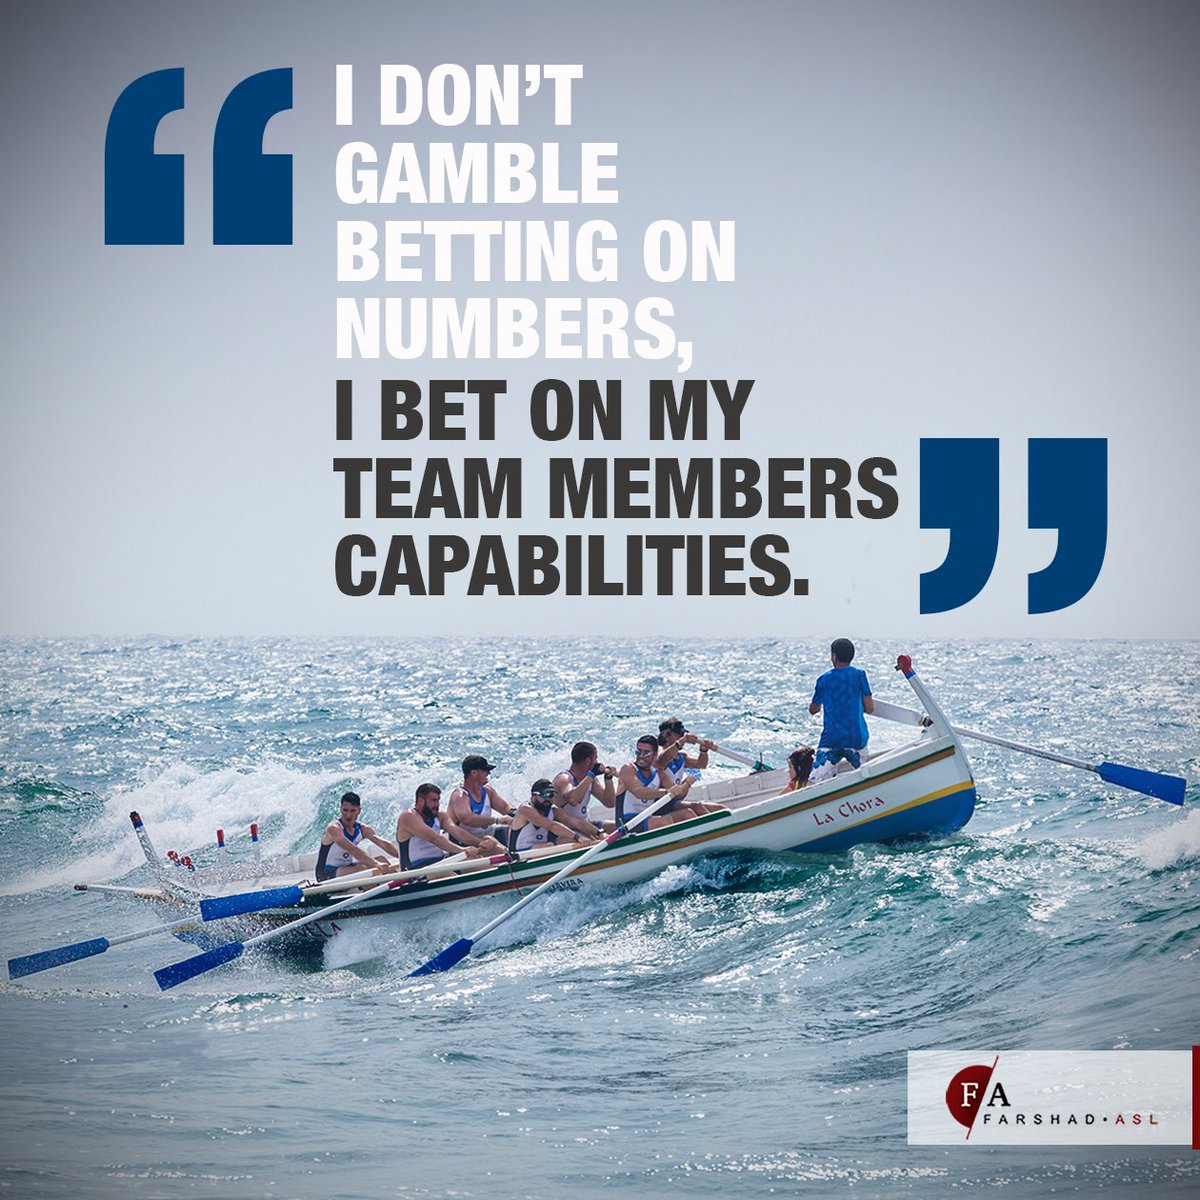 #Leadership #Gambling #Betting on #People not #Numbers https://t.co/UOfNHuAPEZ